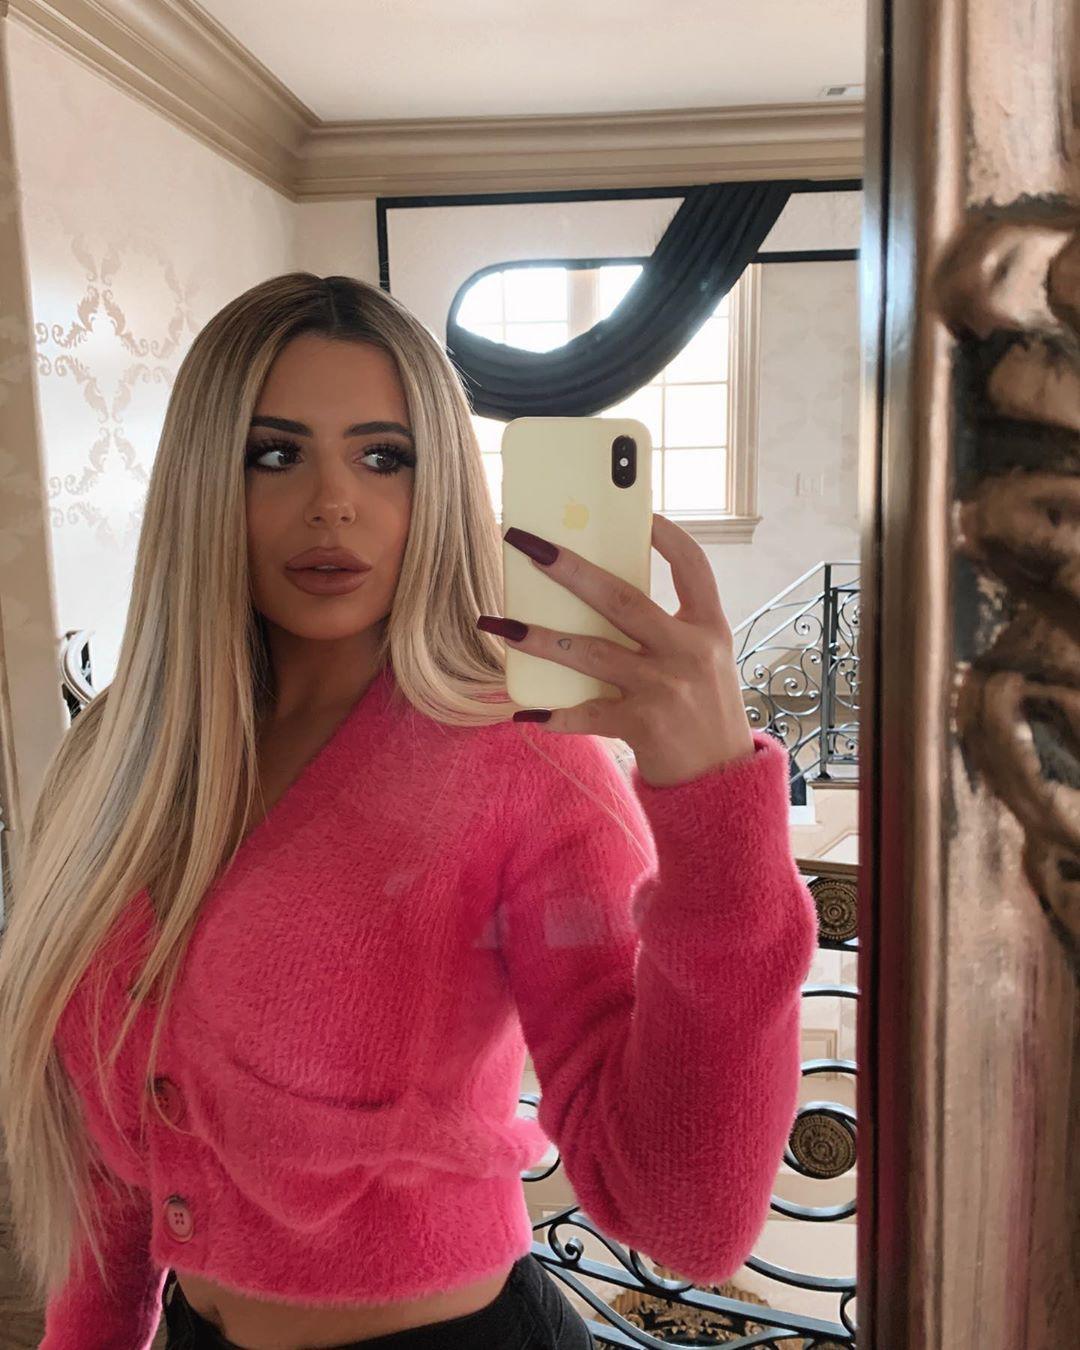 Brielle Biermann Instagram Pictures, Angora wool, Hair coloring